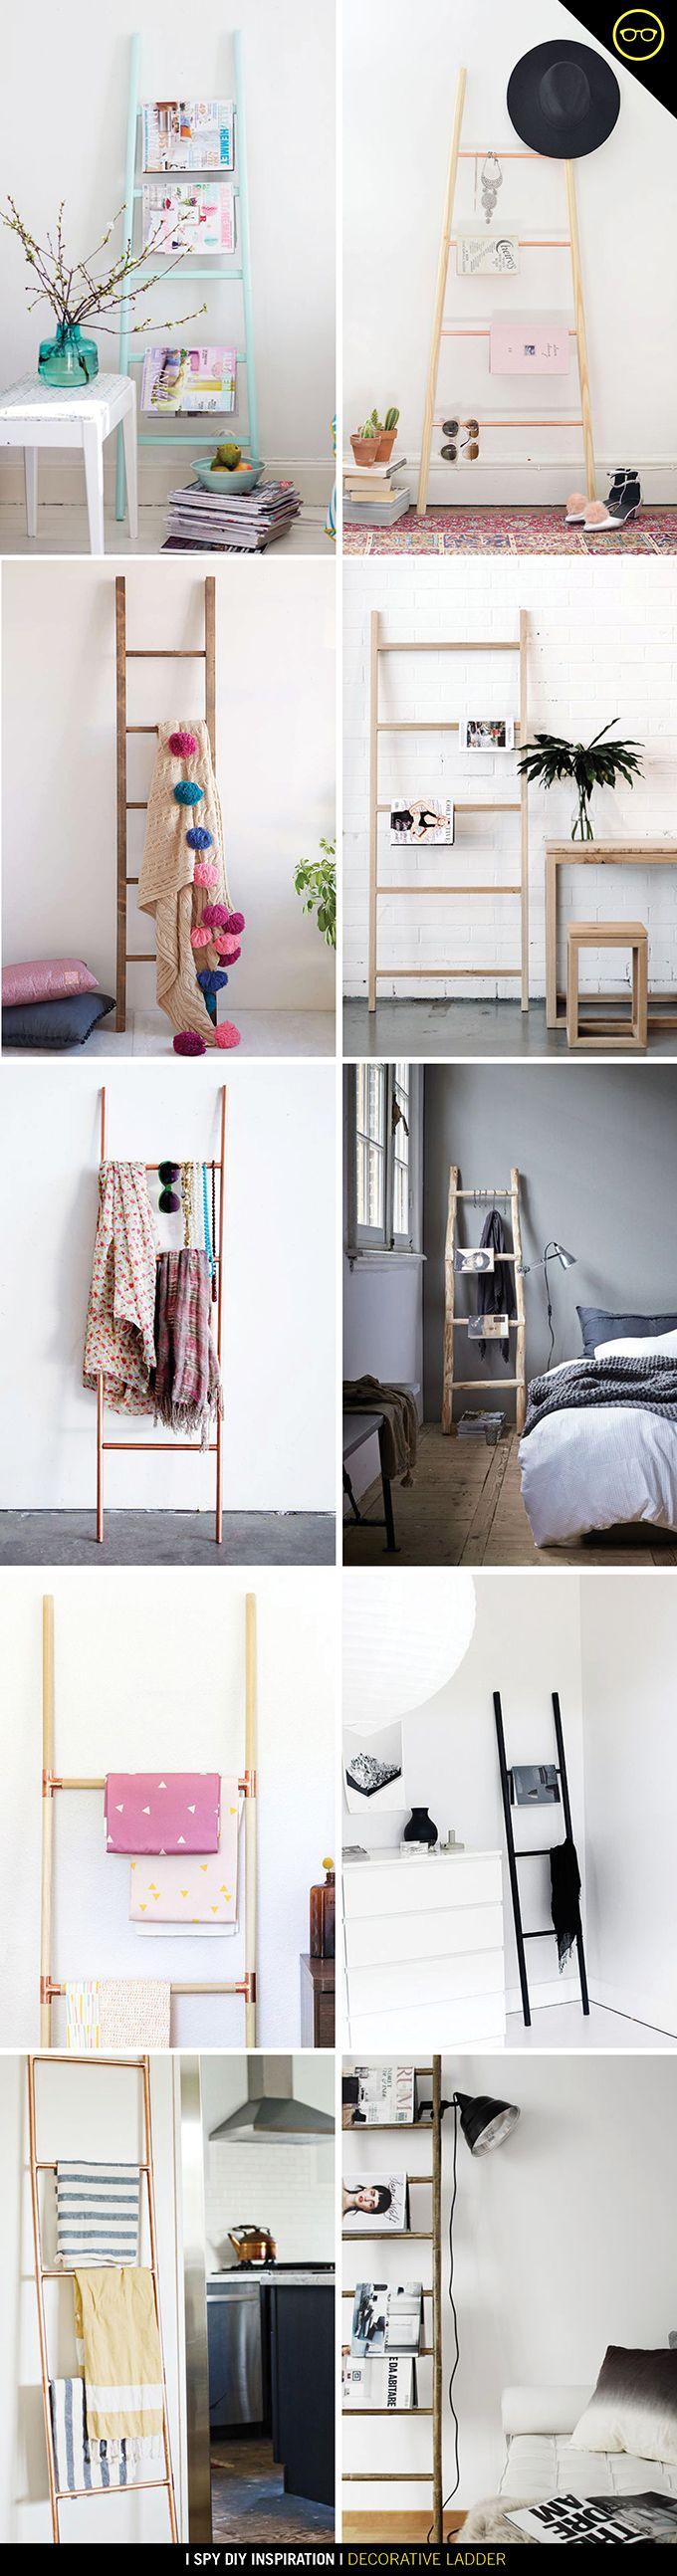 DIY INSPIRATION | Decorative Ladder | I Spy DIY | Bloglovin